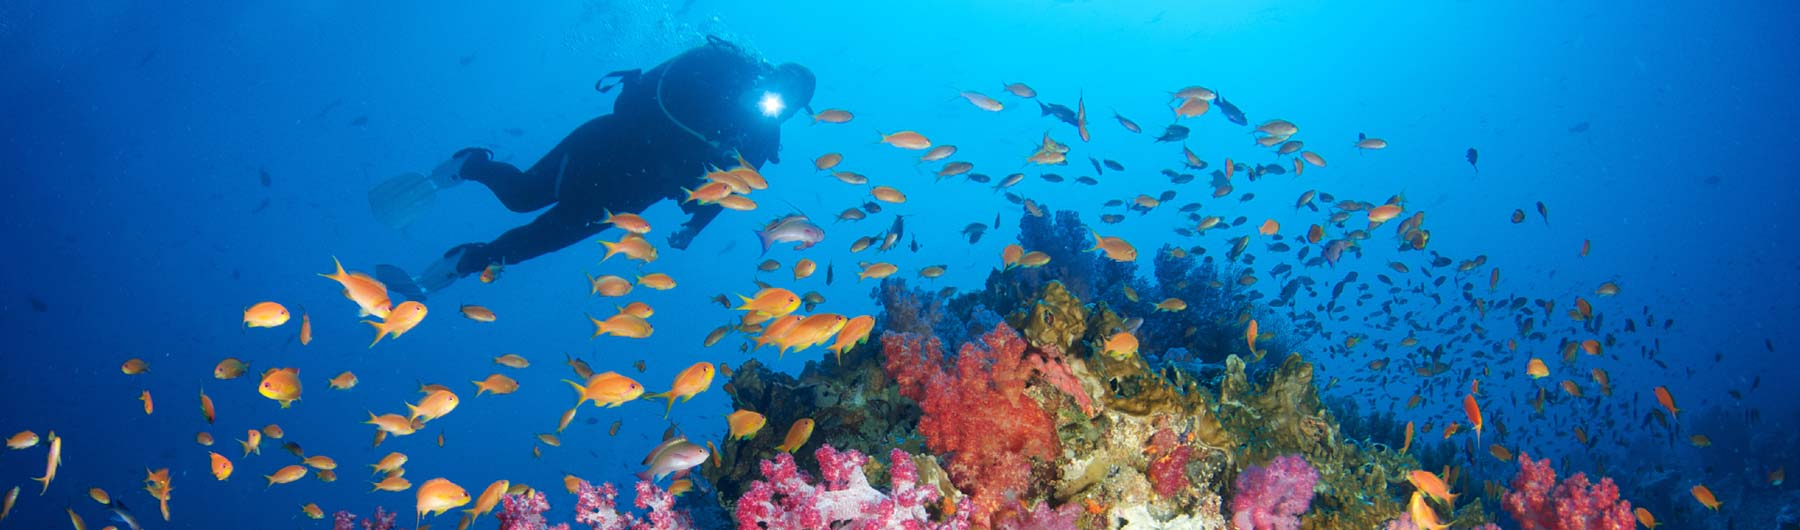 Fiji Liveaboards Scuba Diving Holidays Equator Diving